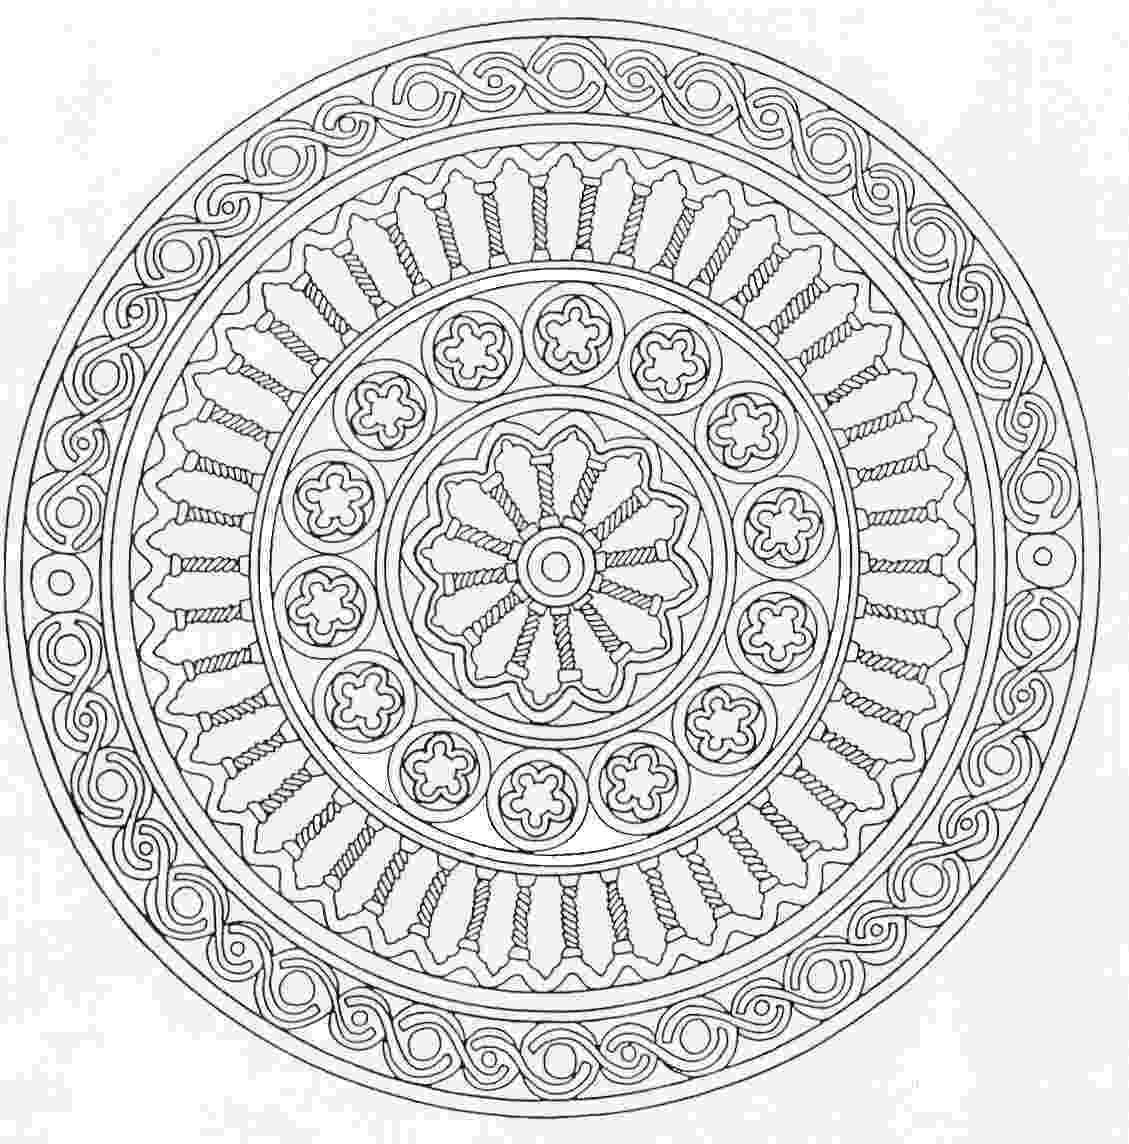 free printable mandala designs free mandala designs to print get your free printable mandala free designs printable